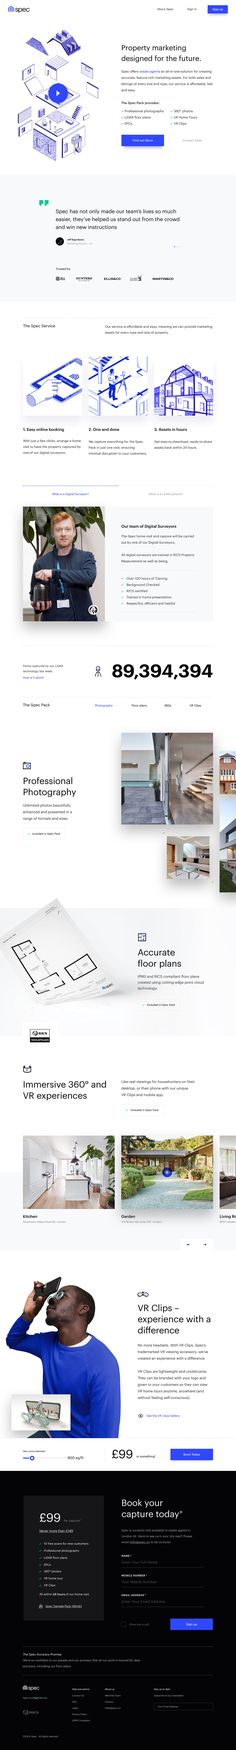 Version 02 Web Design, Graphic Design, Web Colors, Dashboard Ui, Landing Page Design, Design Inspiration, Layout, Website Designs, App